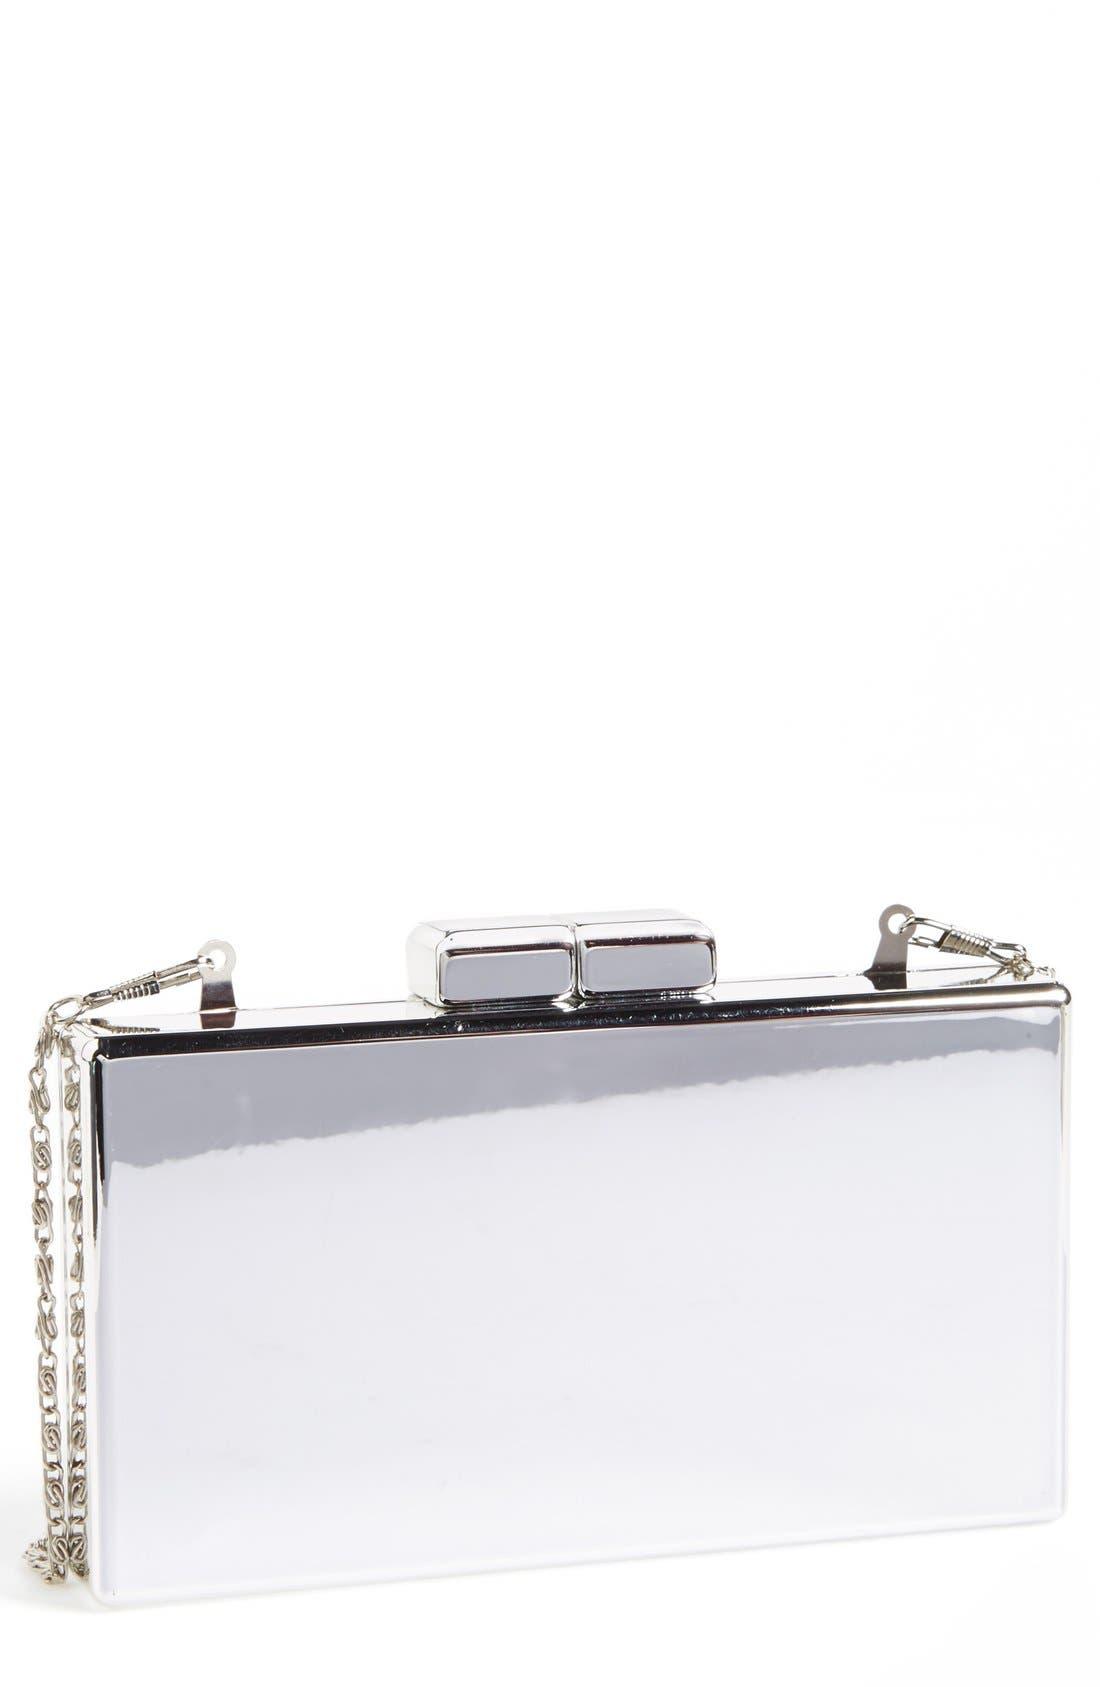 ZZDNU NATASHA COUTURE, Natasha Couture 'Metallic Mirror' Box Clutch, Main thumbnail 1, color, 040